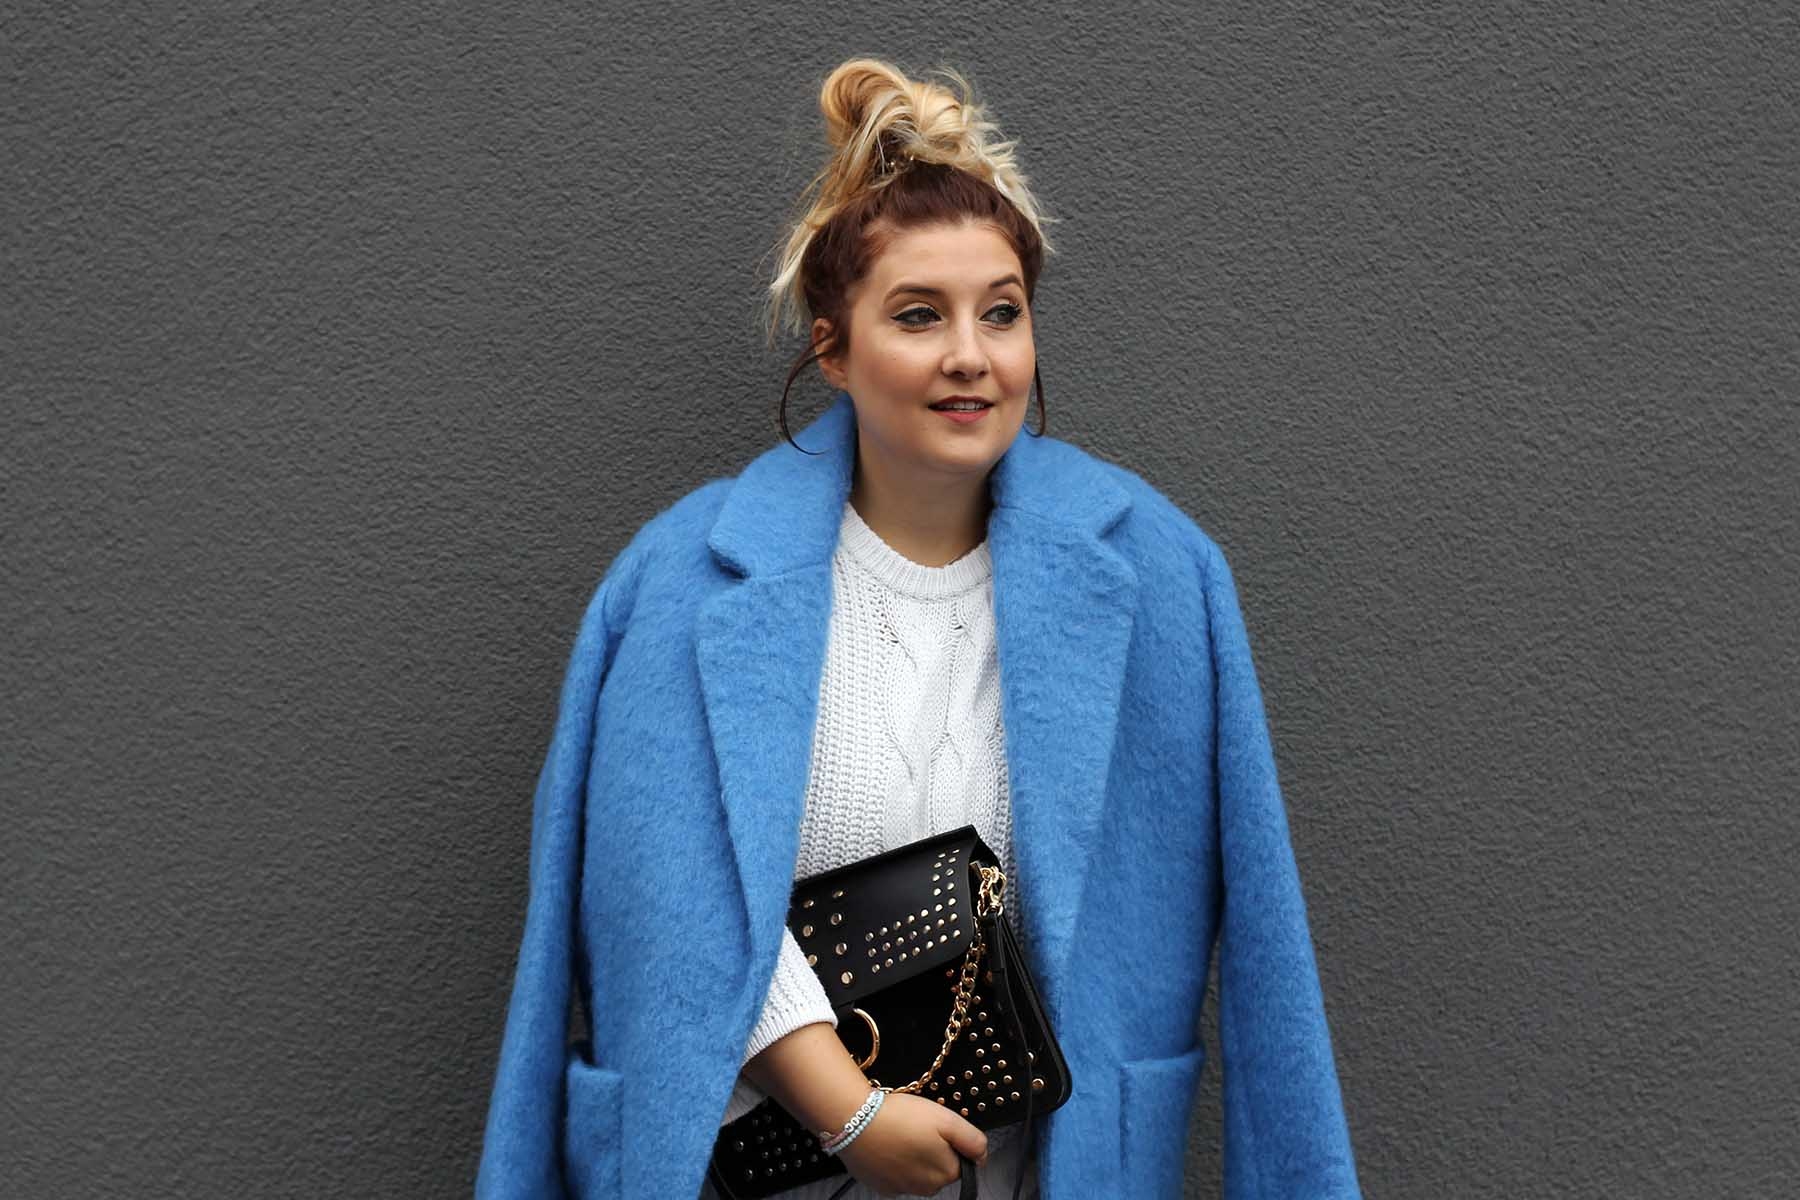 outfit-look-style-modeblog-fashionblog-blauer-mantel-jeans-balenciaga-lookalike-boots-chloe11